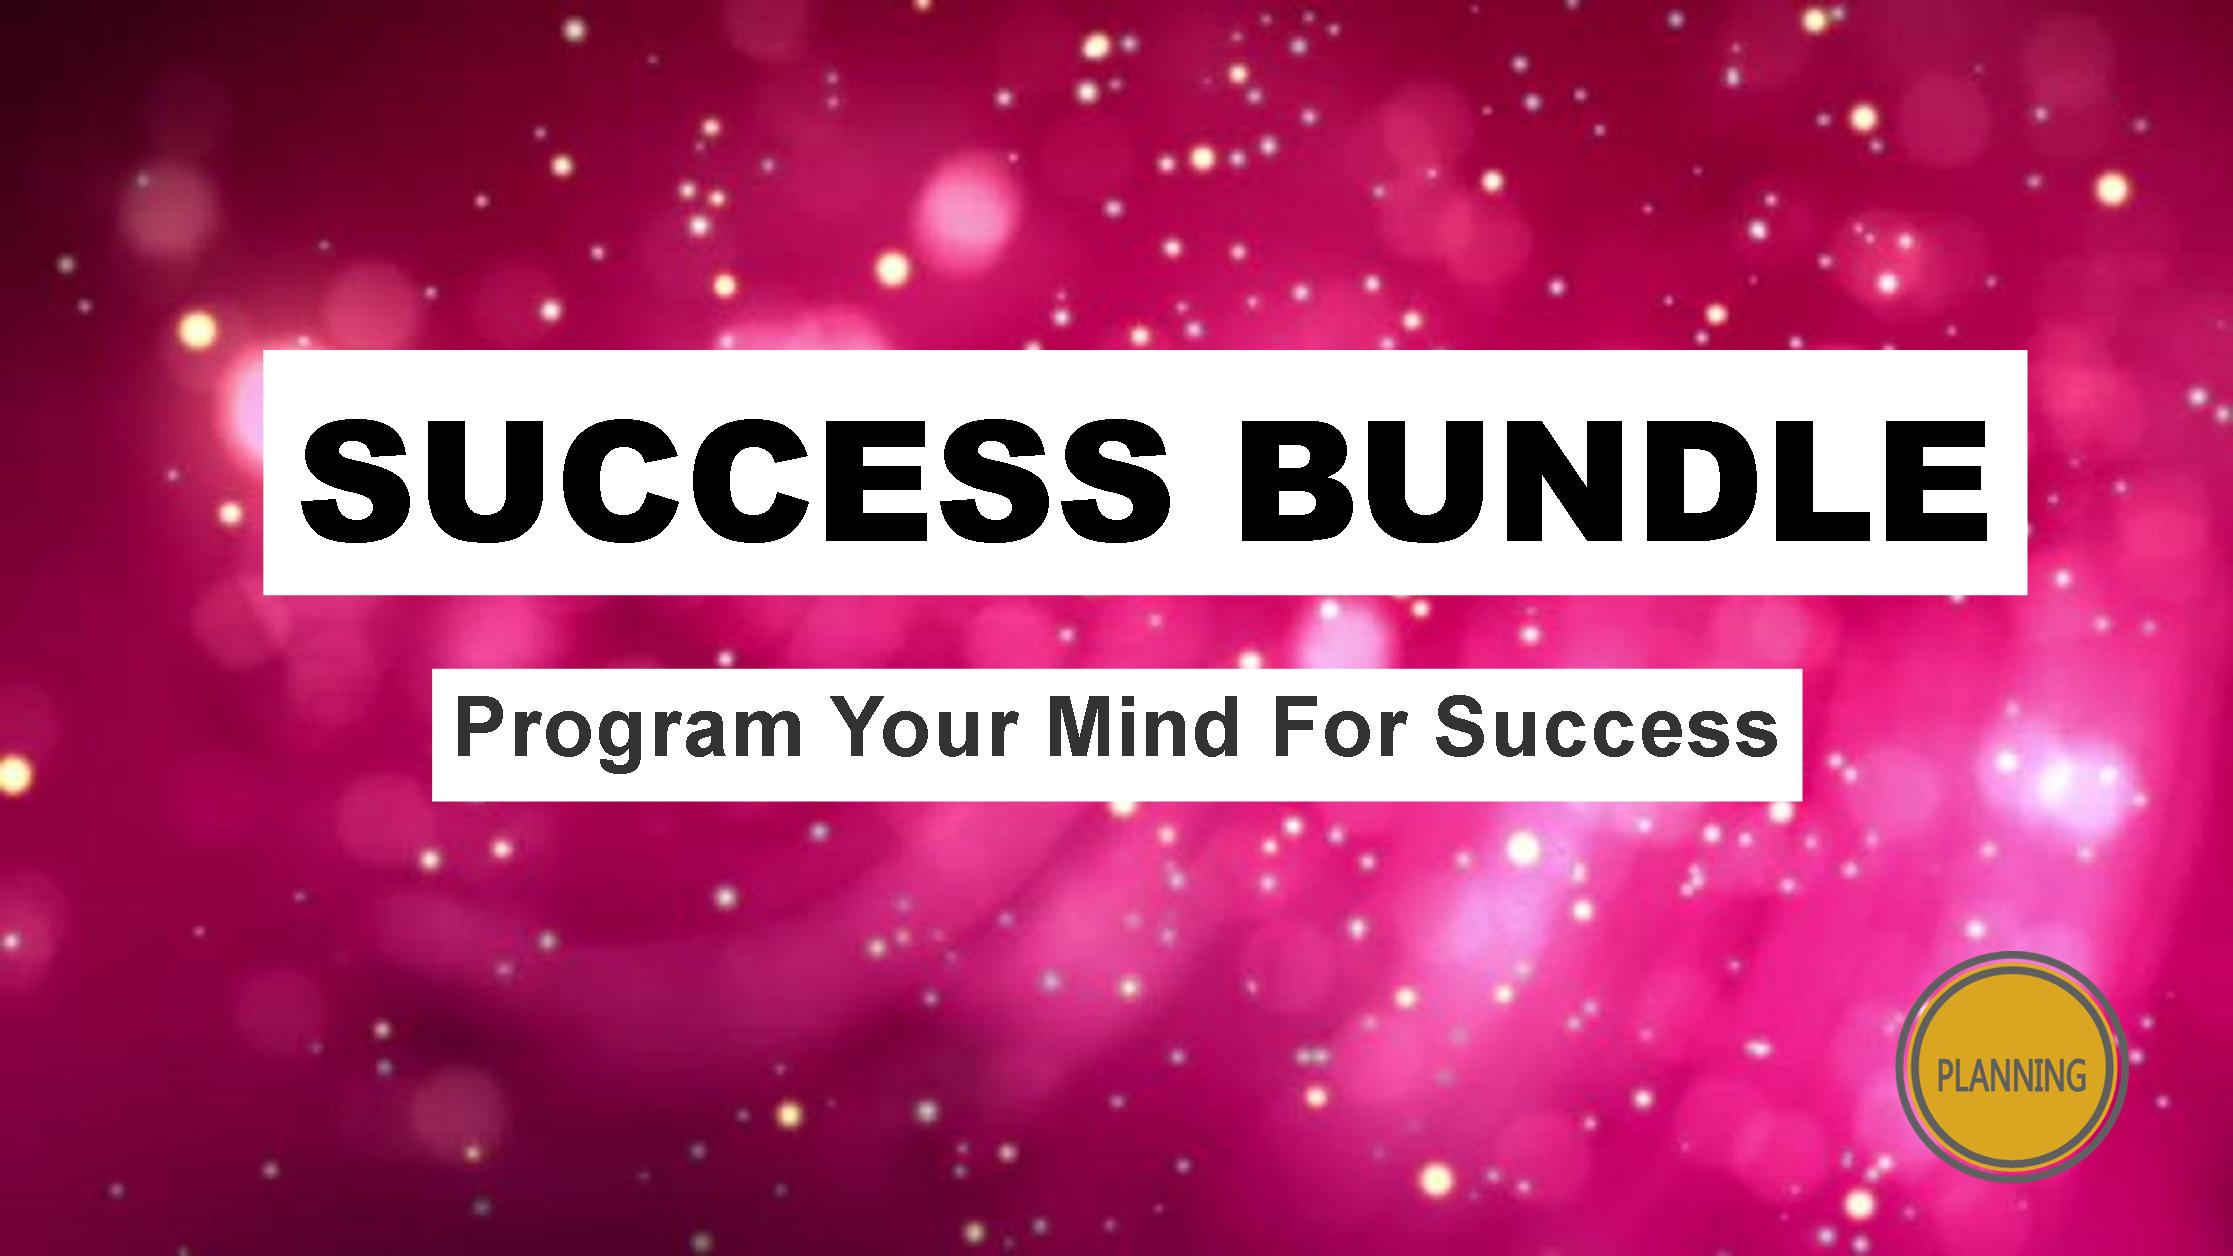 Program Your Mind For Success